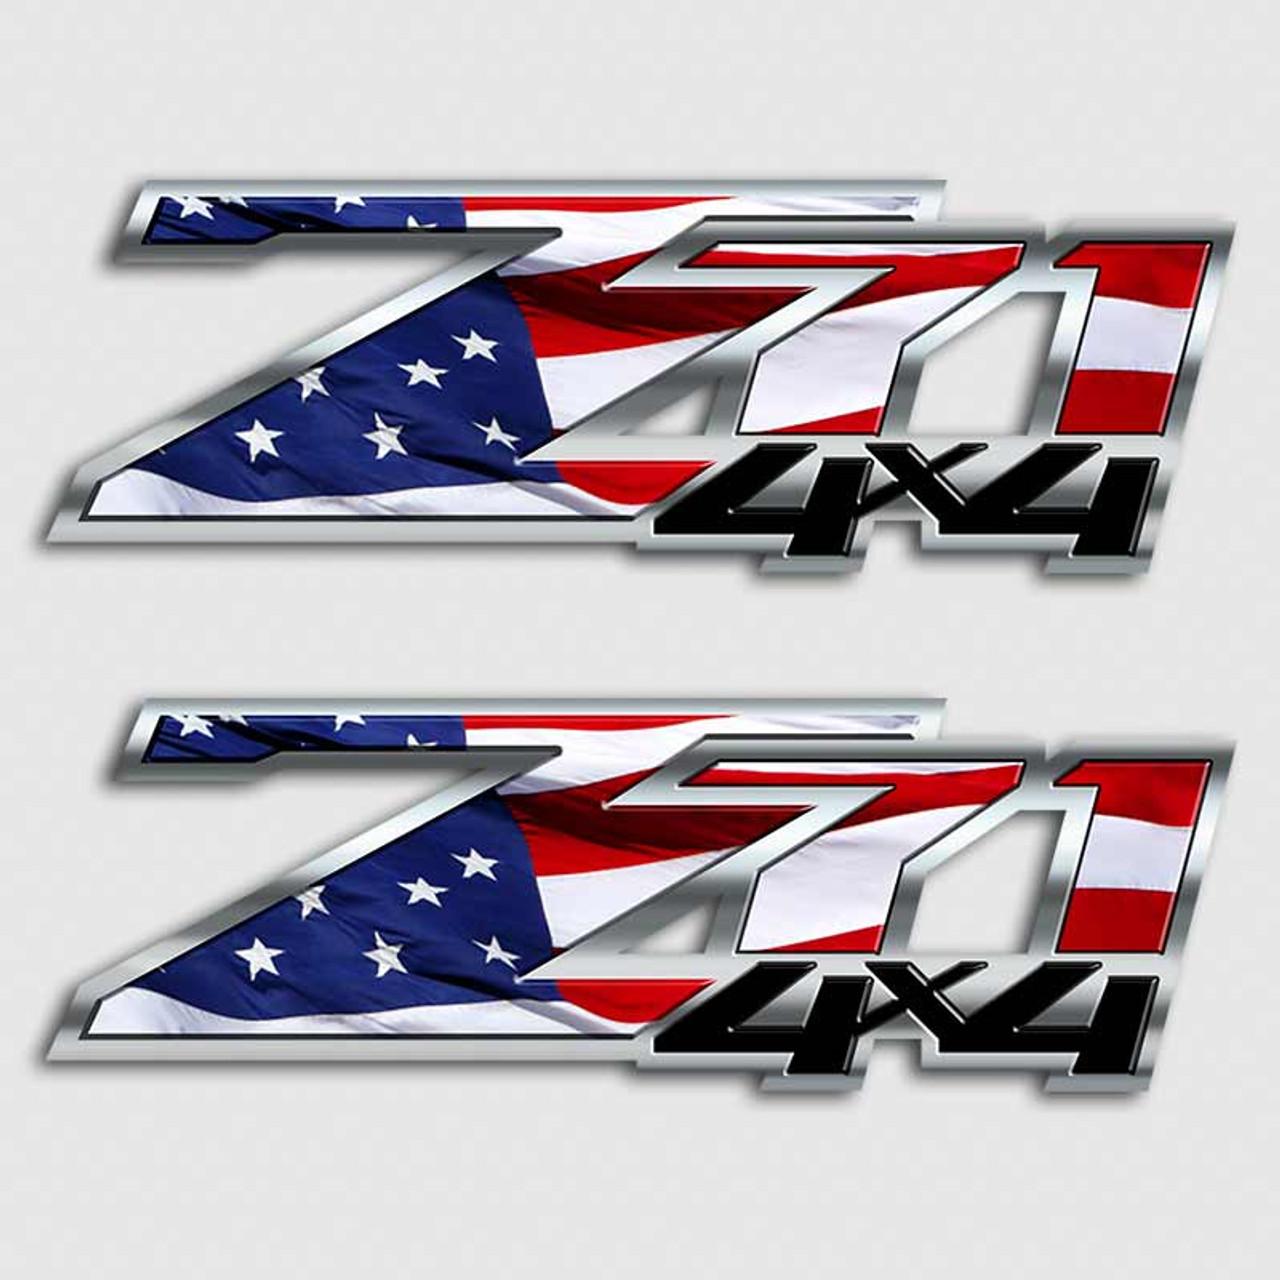 American Flag Silverado Z71 Truck Decal Set | Chevy 4x4 USA